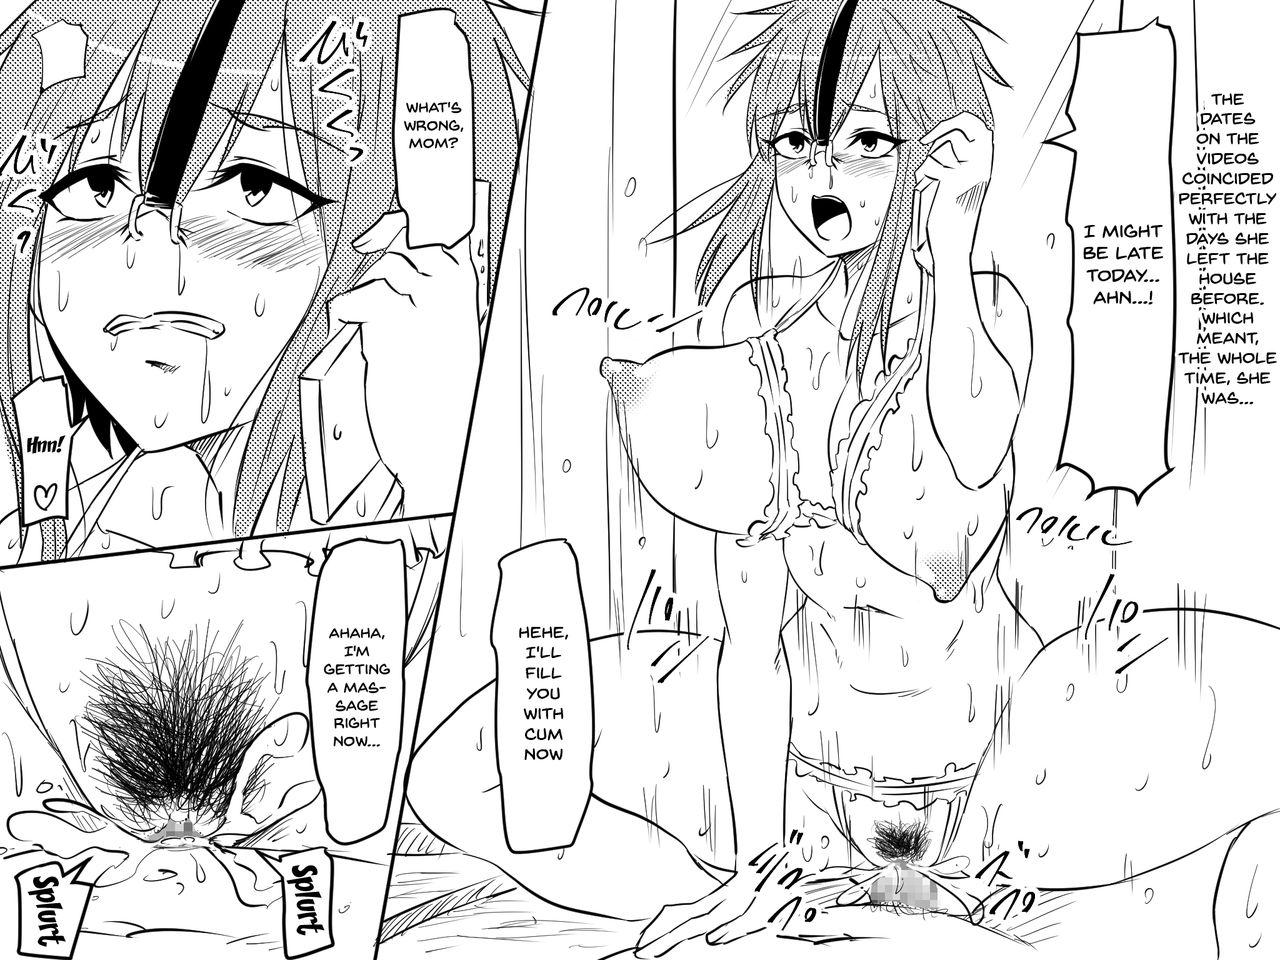 [Mikezoutei] Netorare Haha ~Kachiki de Kimottama no Okaa-san ga Boku o Ijimeru Aitsu no Onna ni Naru Hanashi~   Mom NTR ~A Story Of How My Gutsy Mom Ended Up Becoming My Bully's Plaything~ [English] {Doujins.com} 17